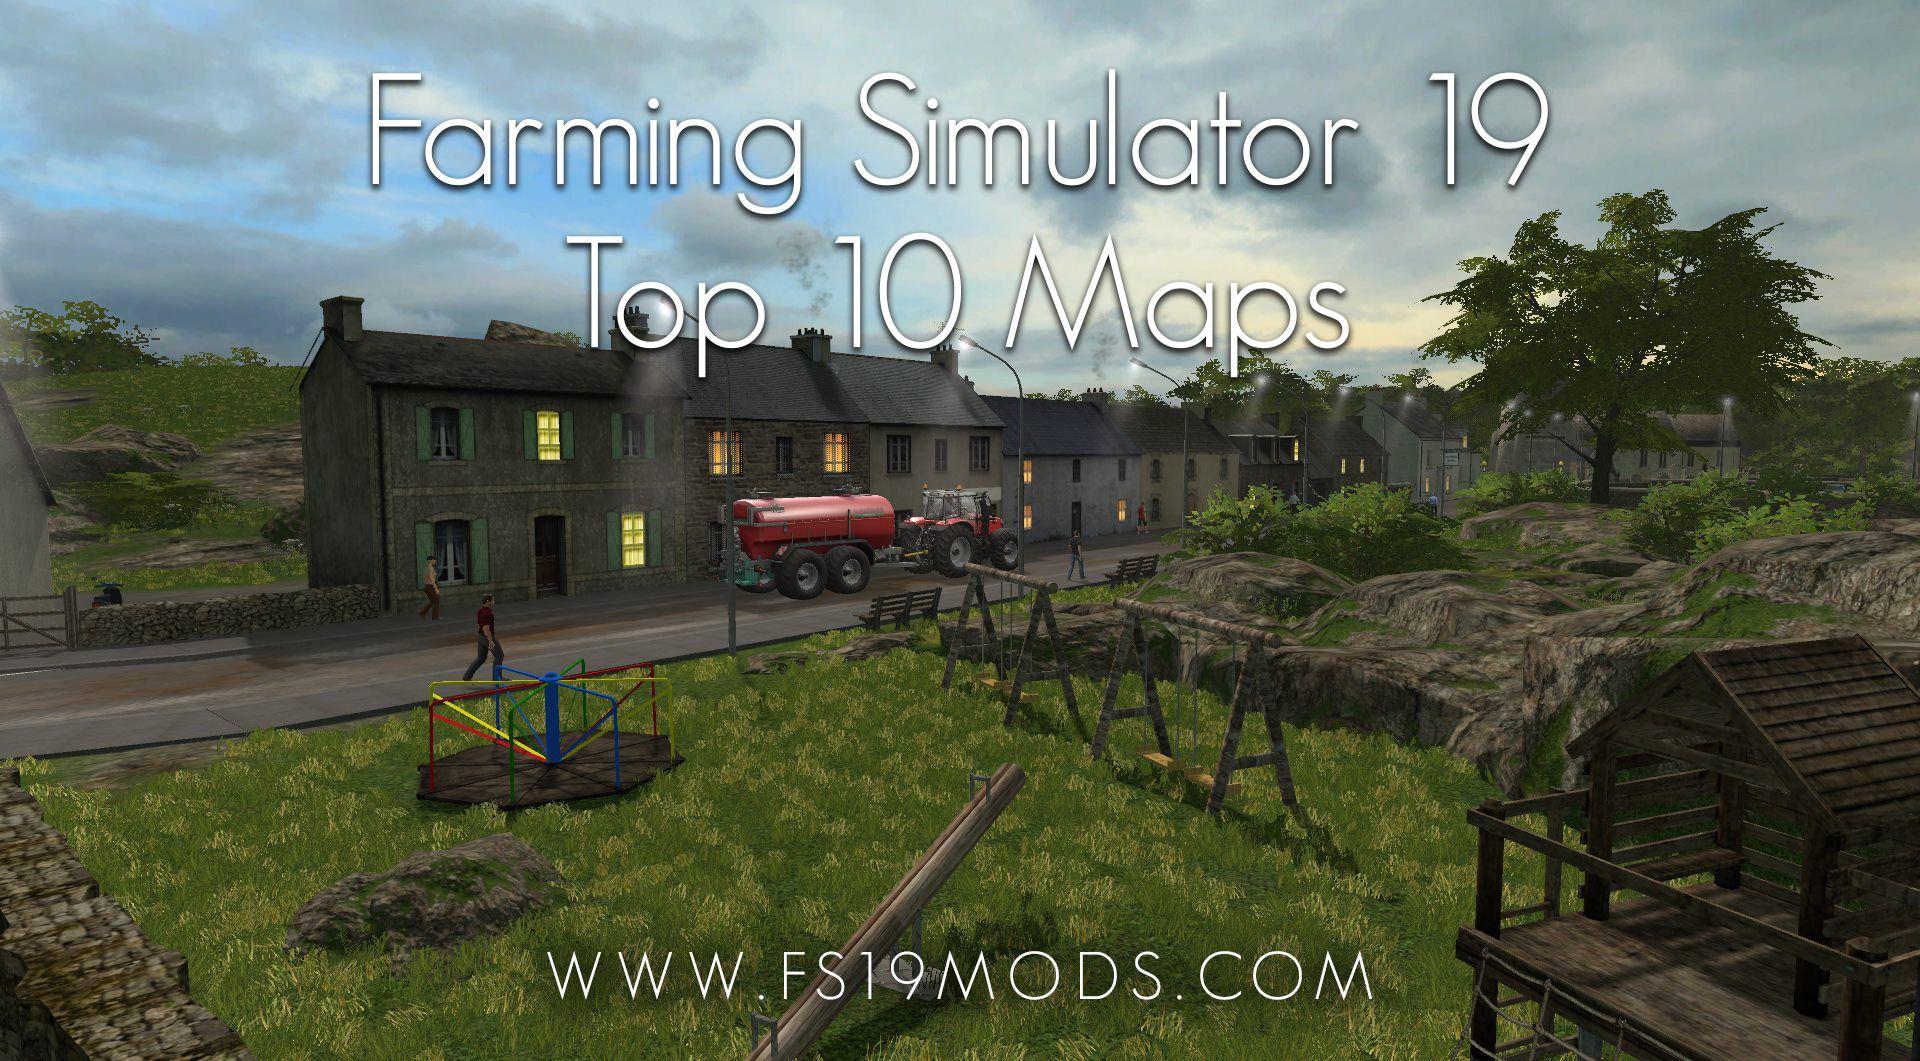 Farming Simulator 19 / 2019 Top 10 Maps | Farming Simulator 19